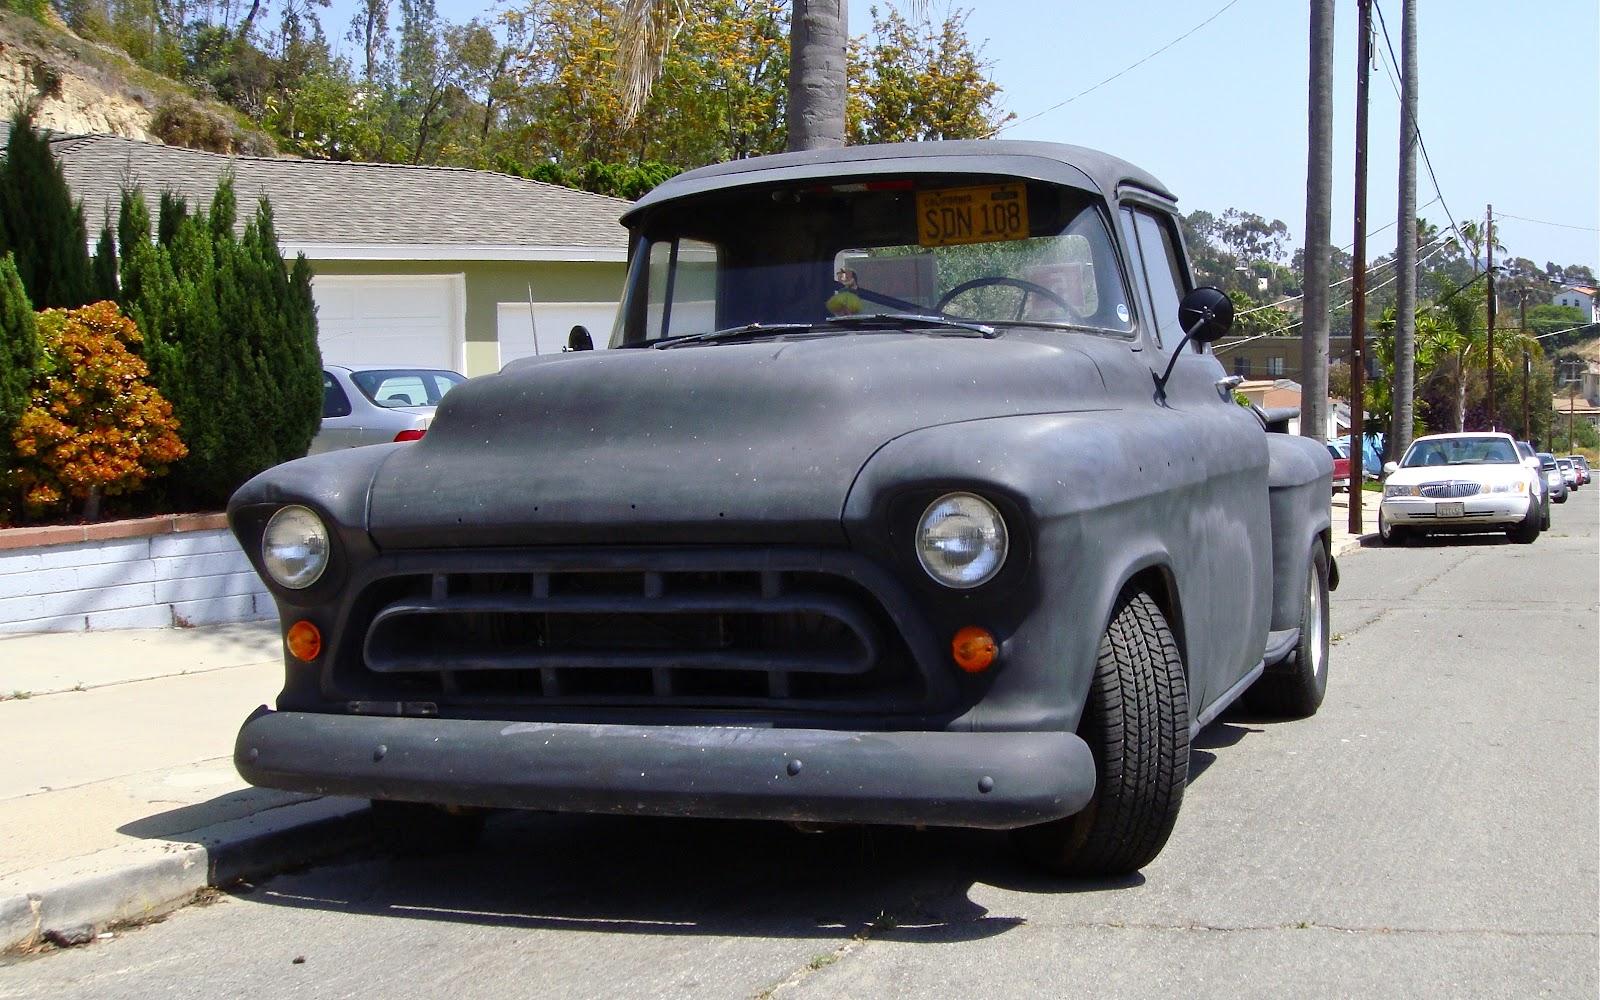 THE STREET PEEP: 1956 Chevrolet Apache